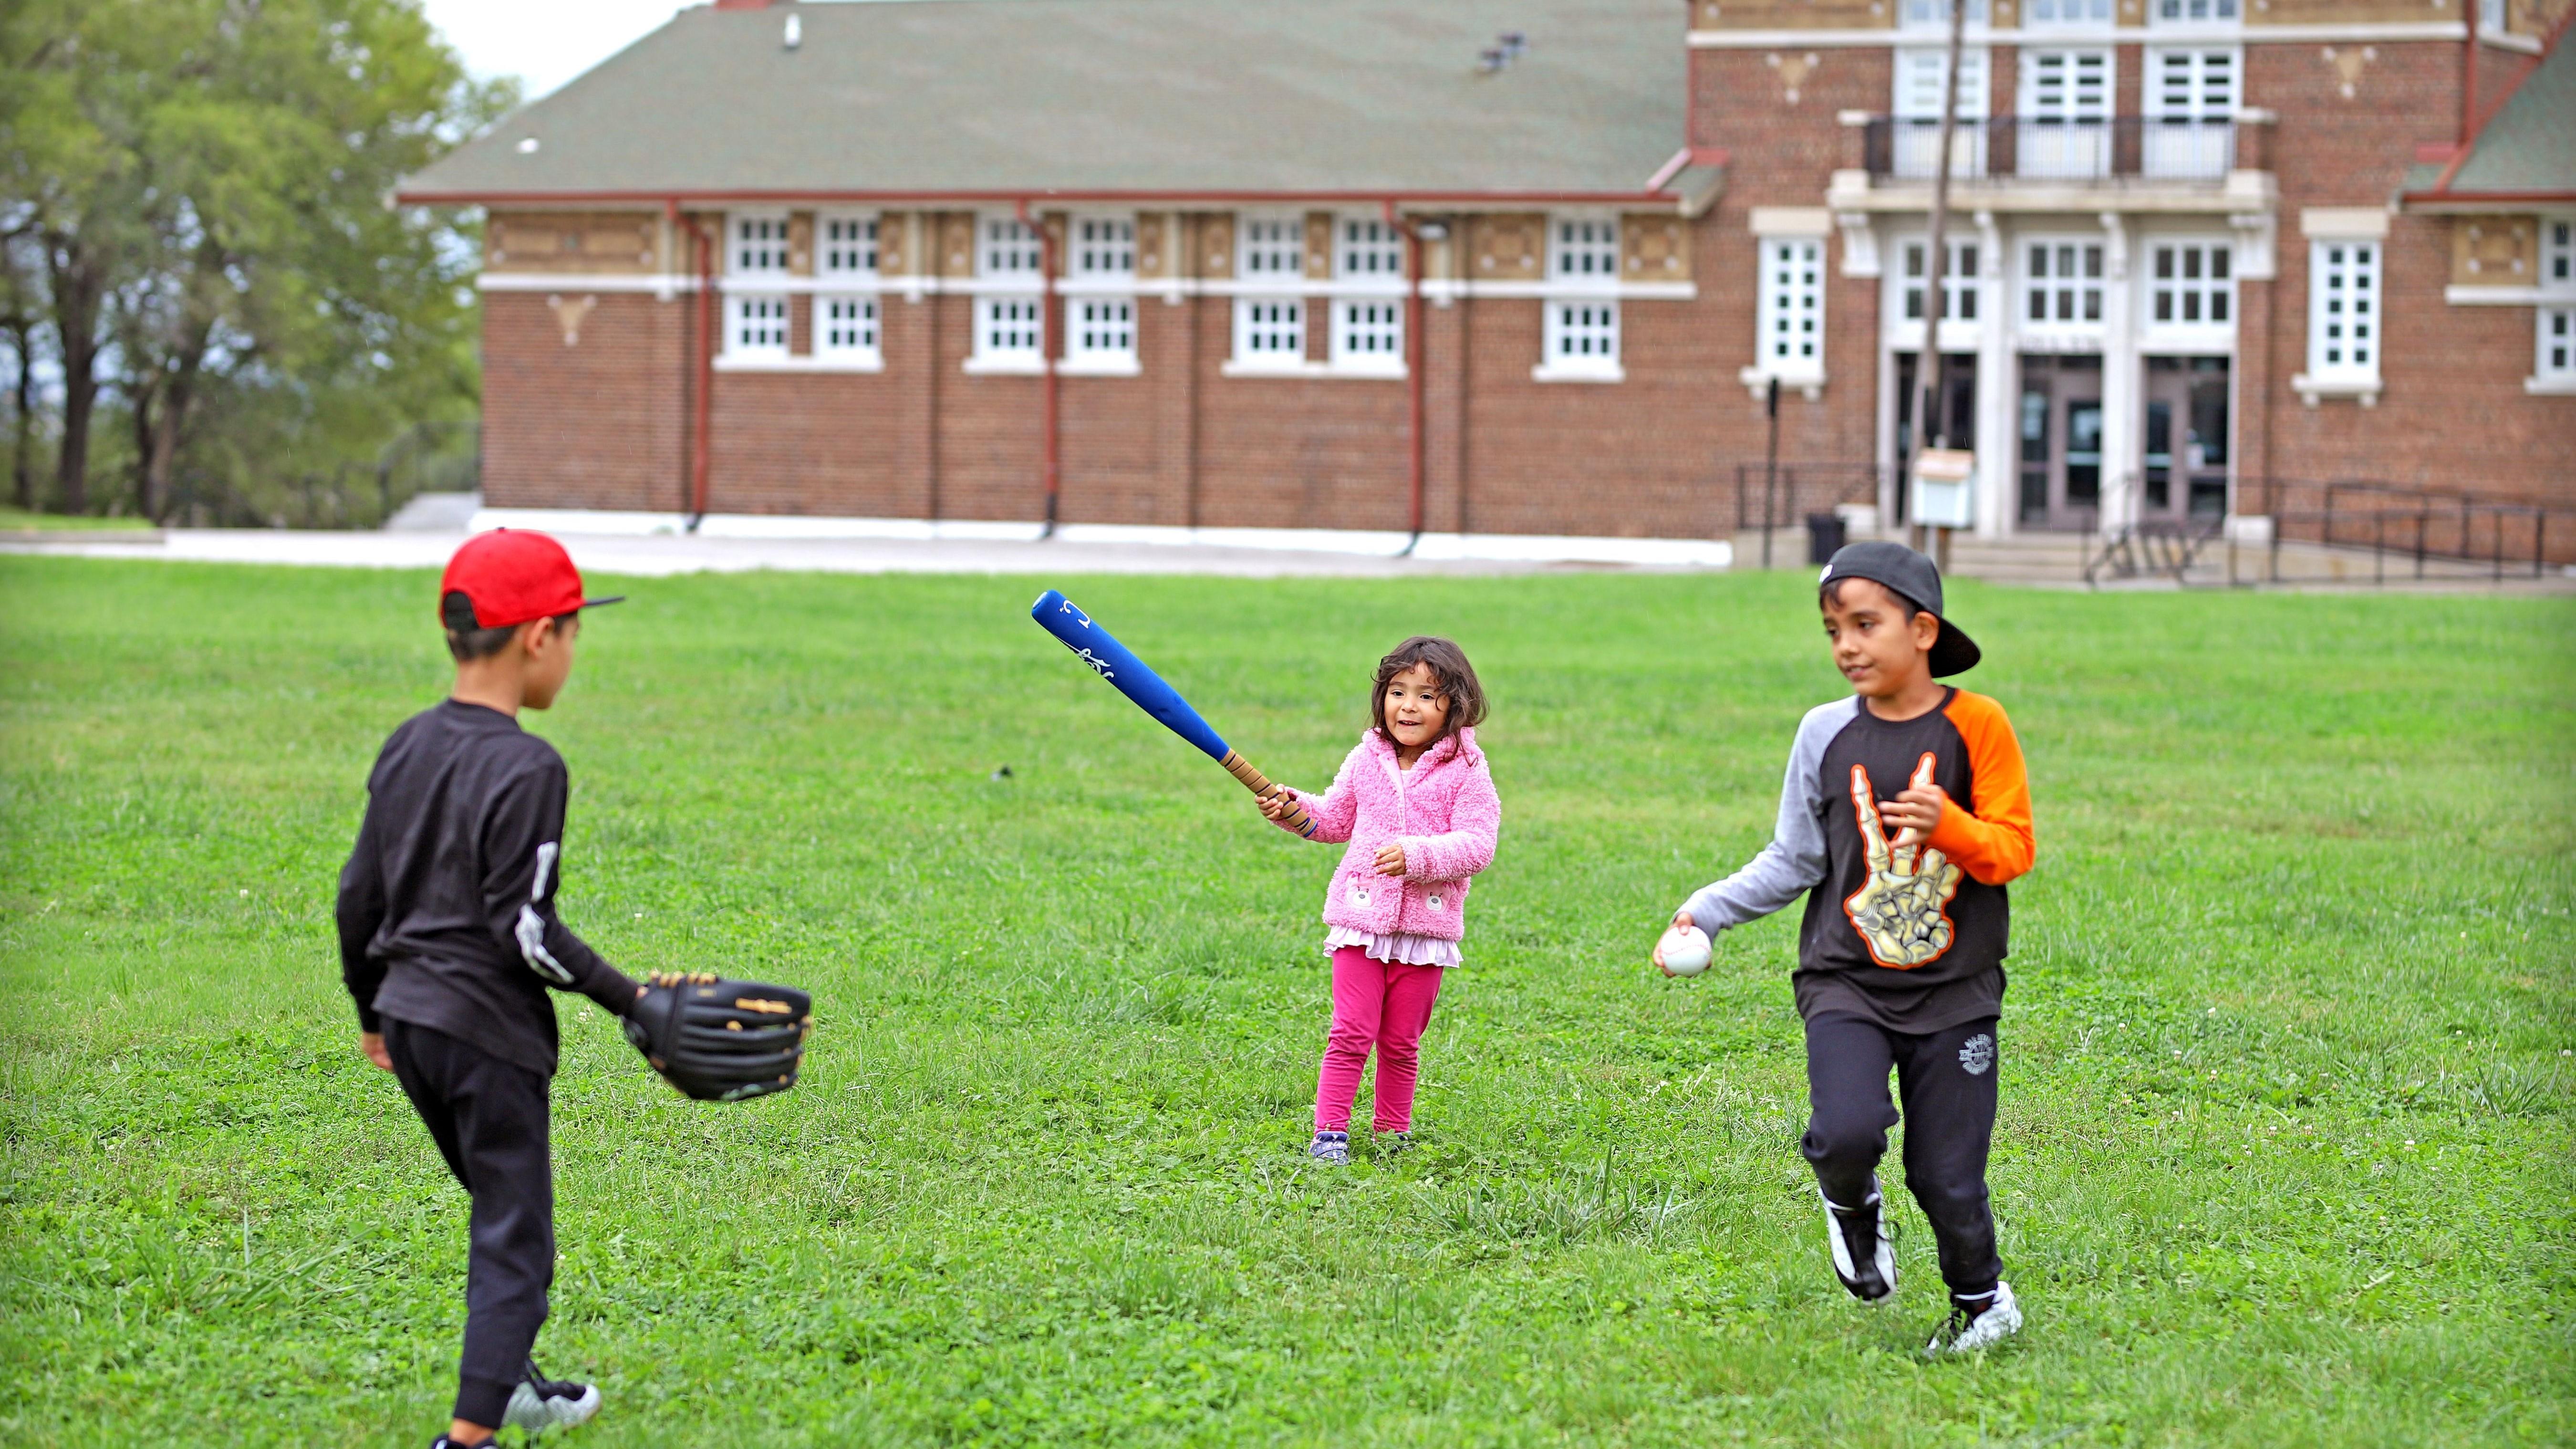 Kids playing baseball infront of Garrison Square